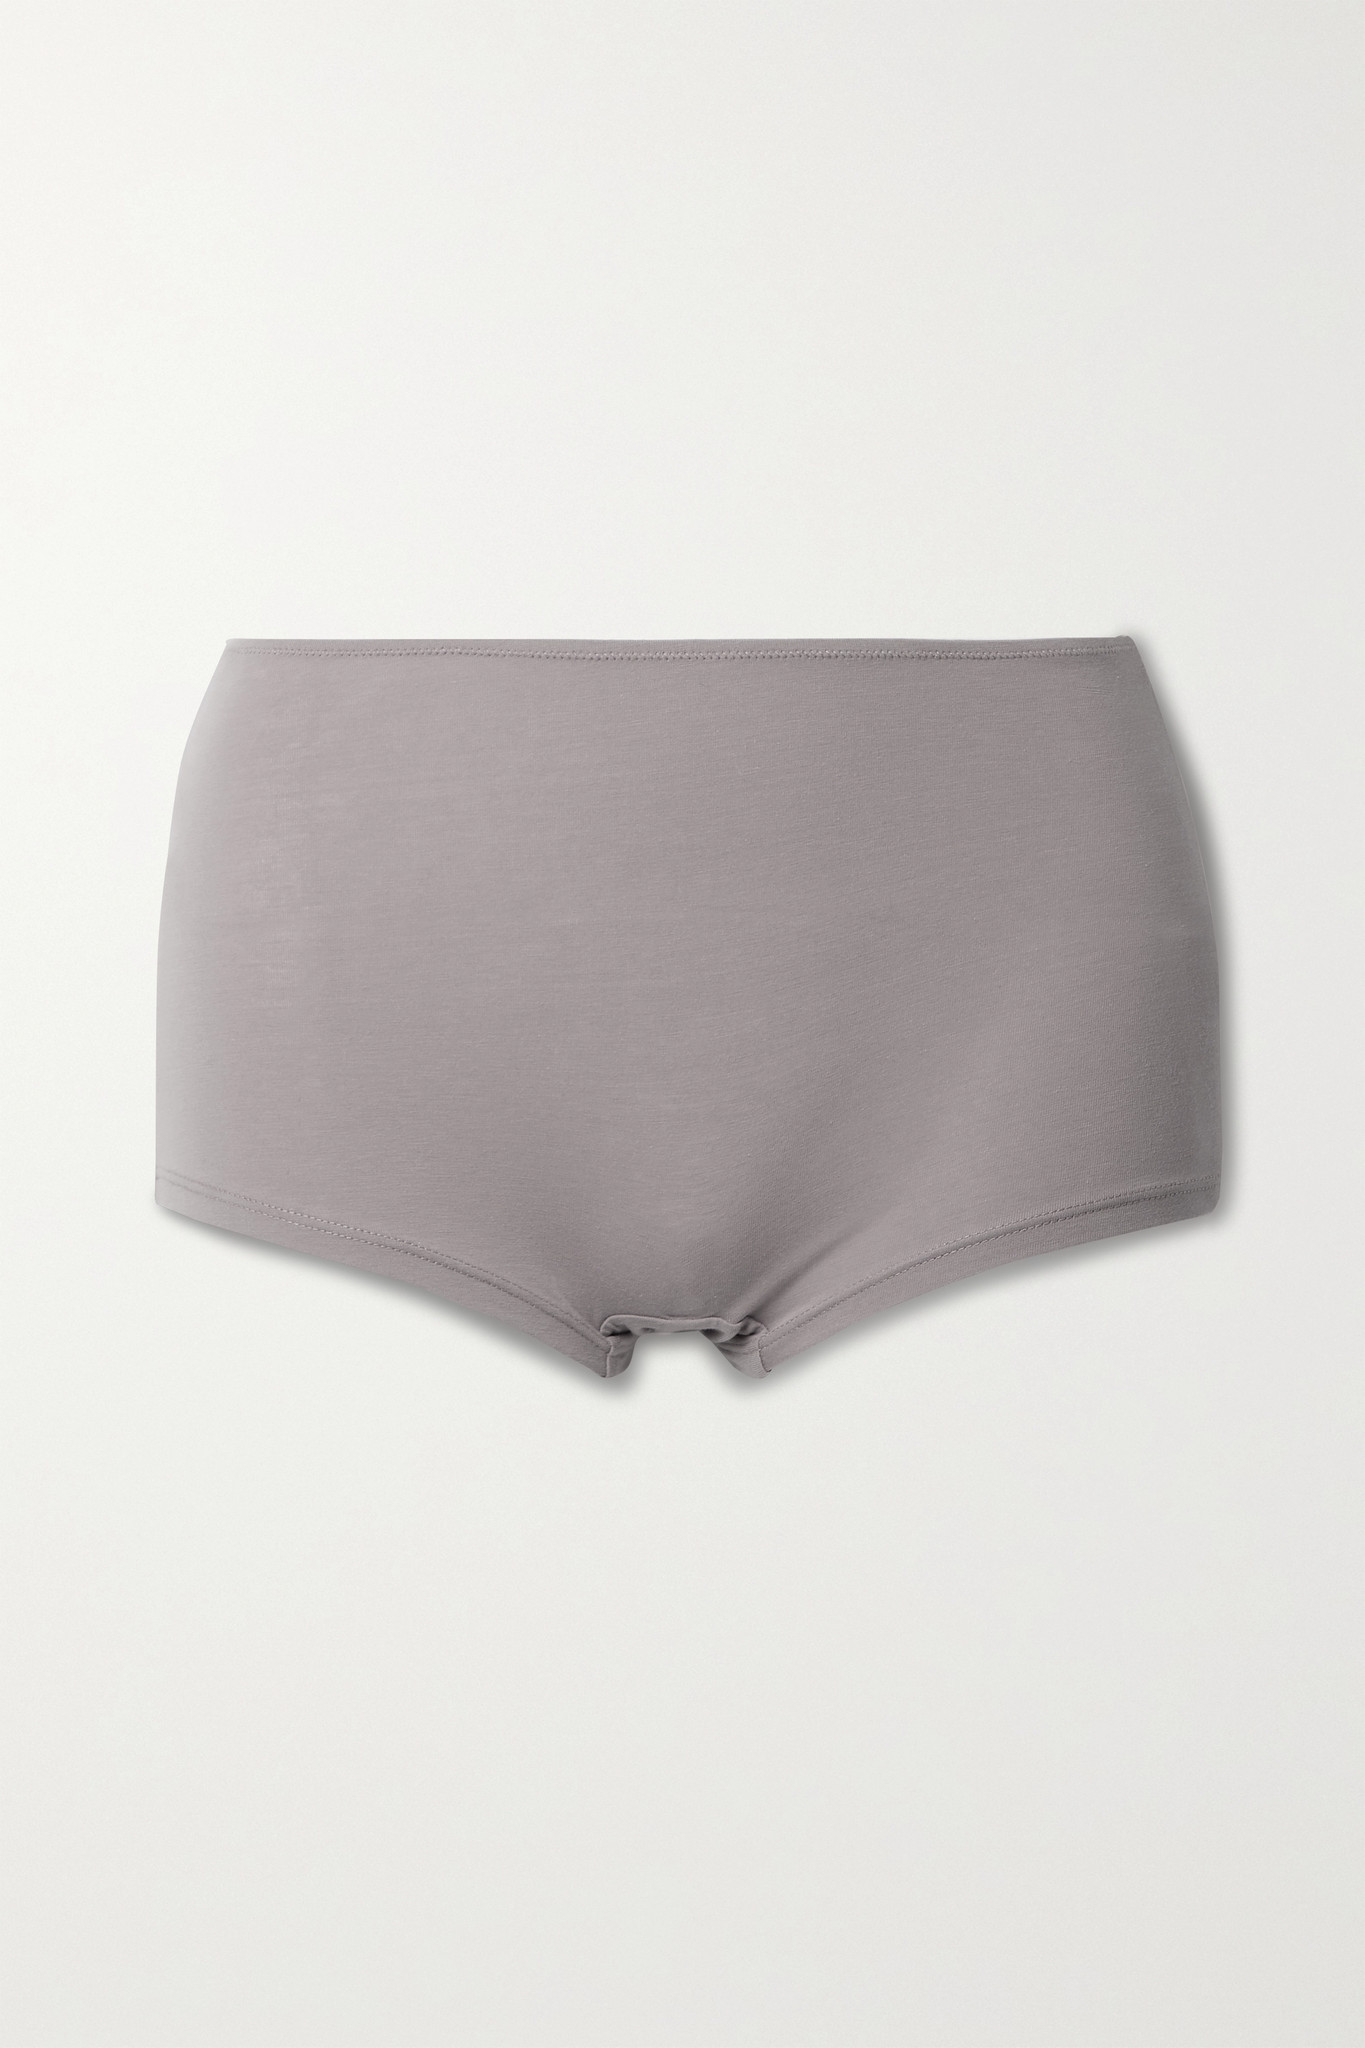 SKIN - 【net Sustain】gayle 弹力有机比马棉质平纹布三角裤 - 中性色 - large